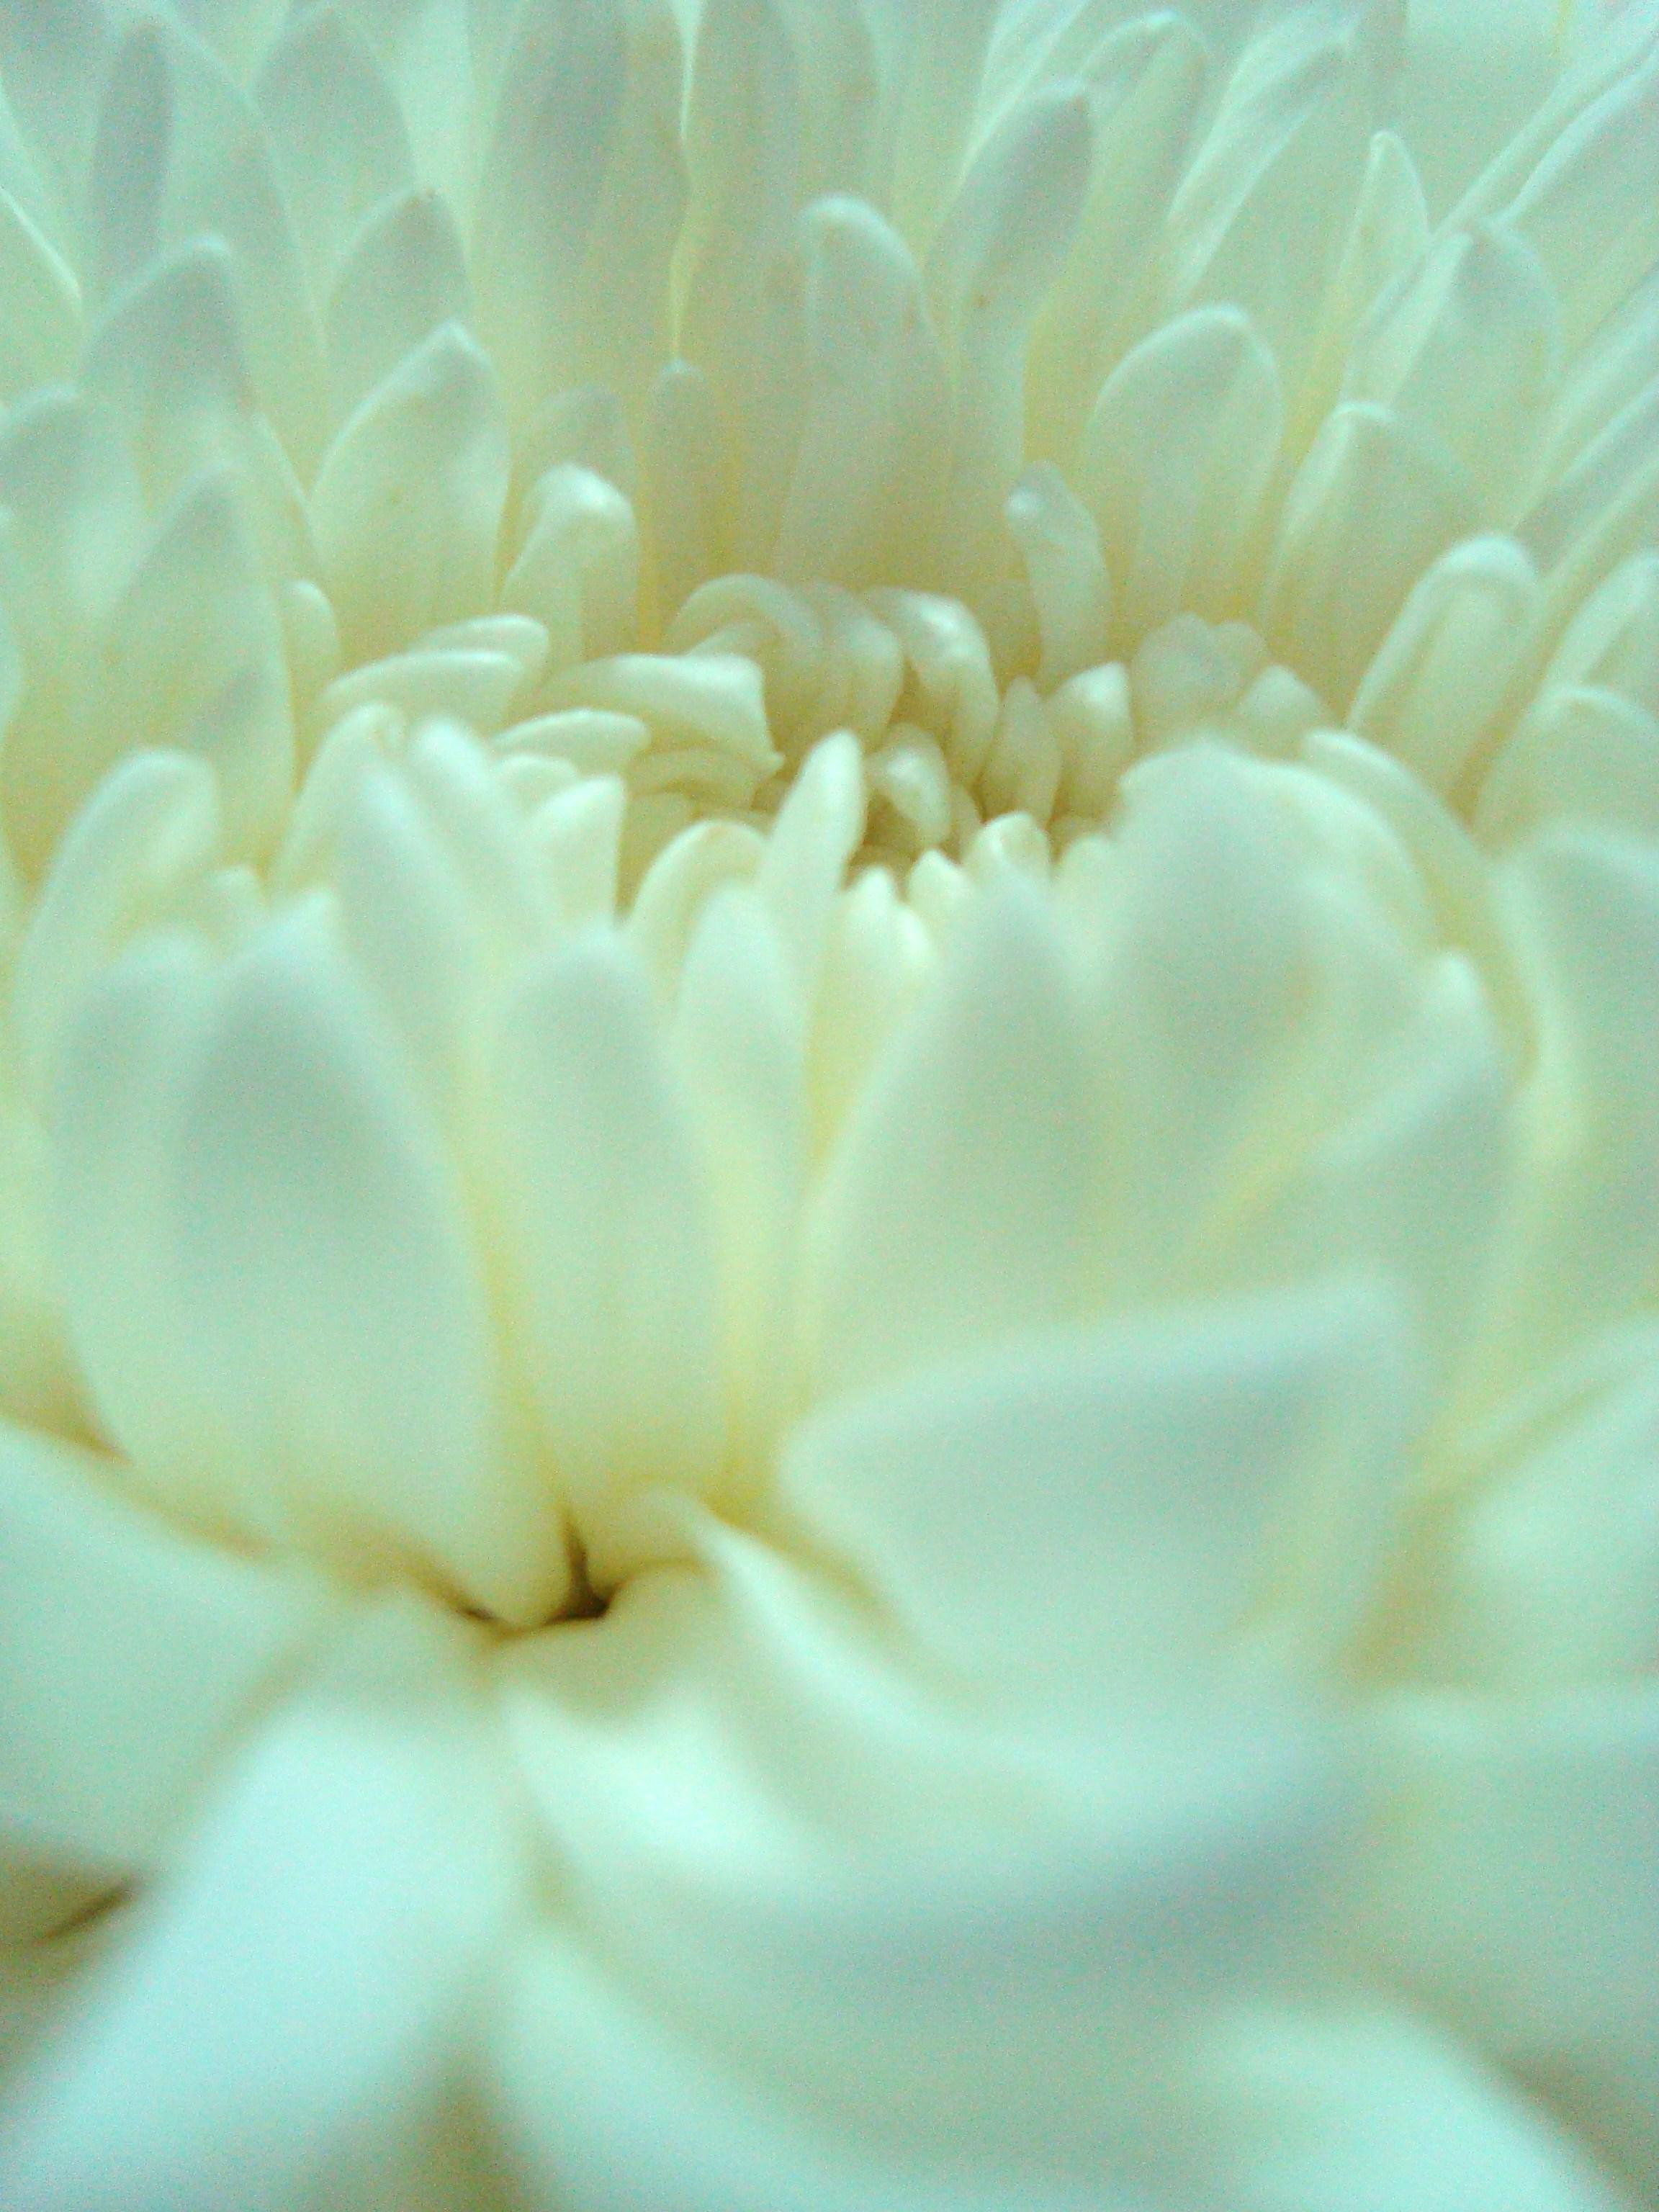 White Flower Close-Up, Arranged, Petals, Stylish, Stamen, HQ Photo